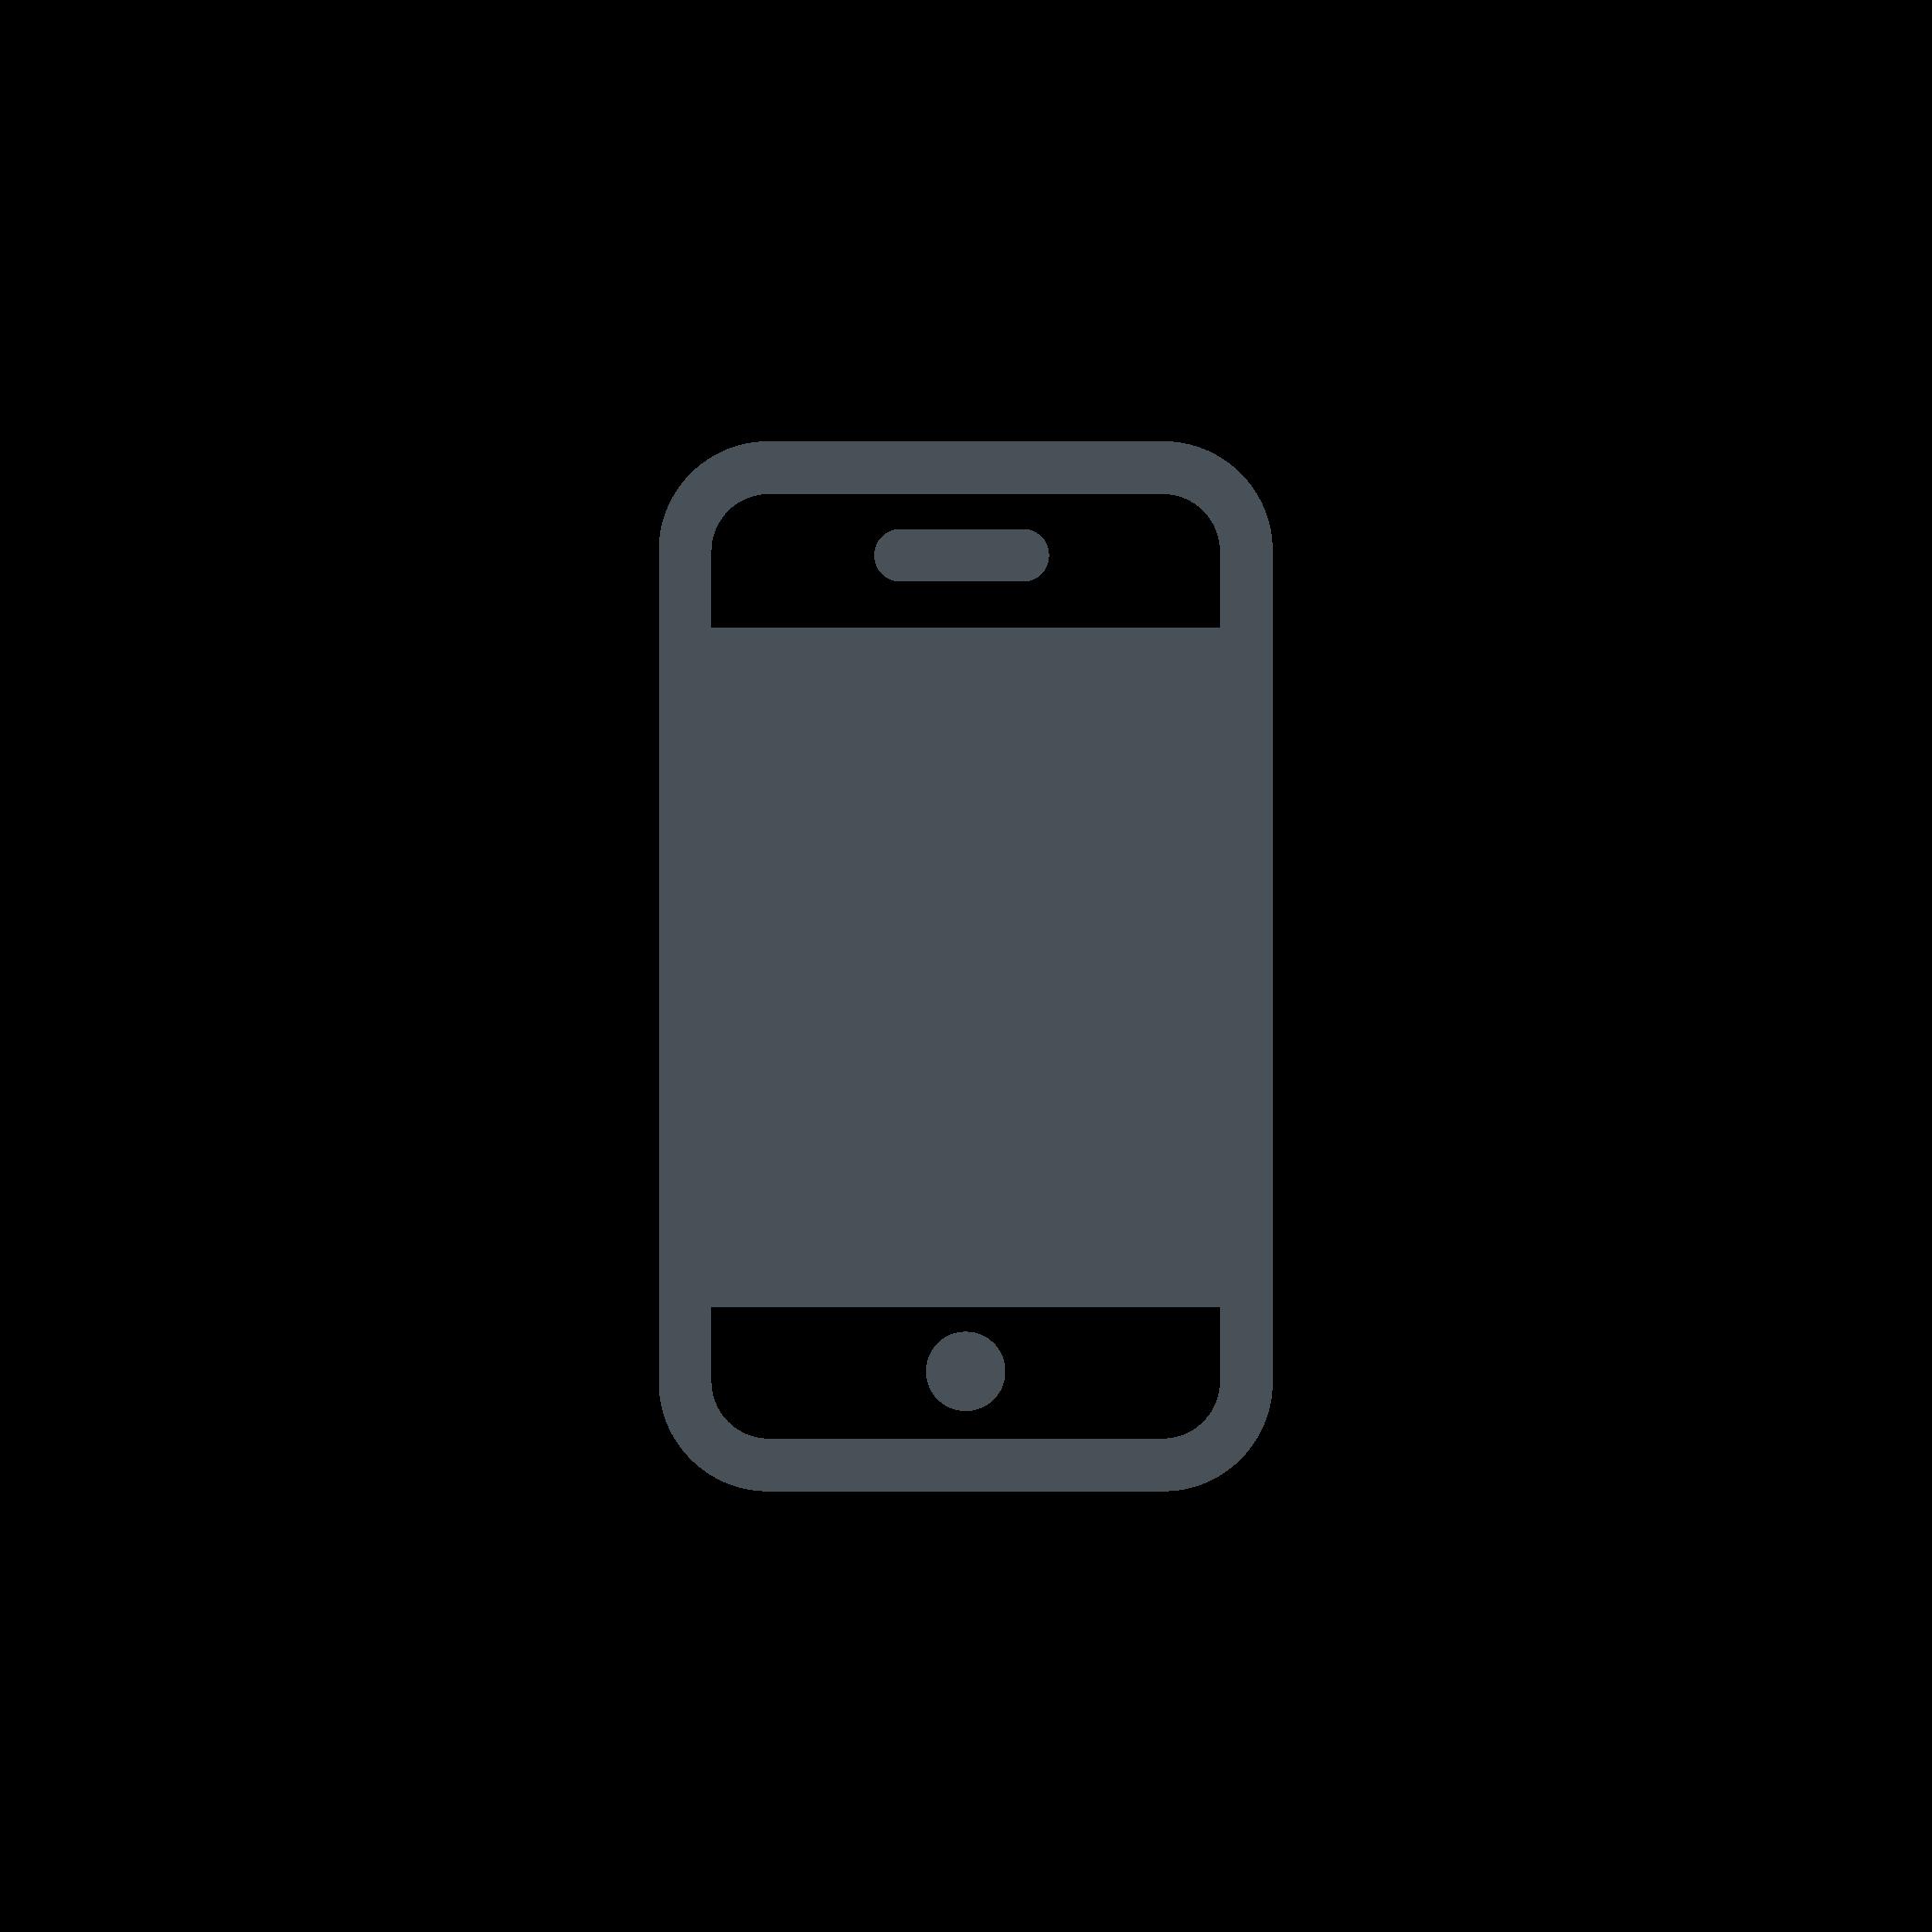 Grey-Solid_Smartphone